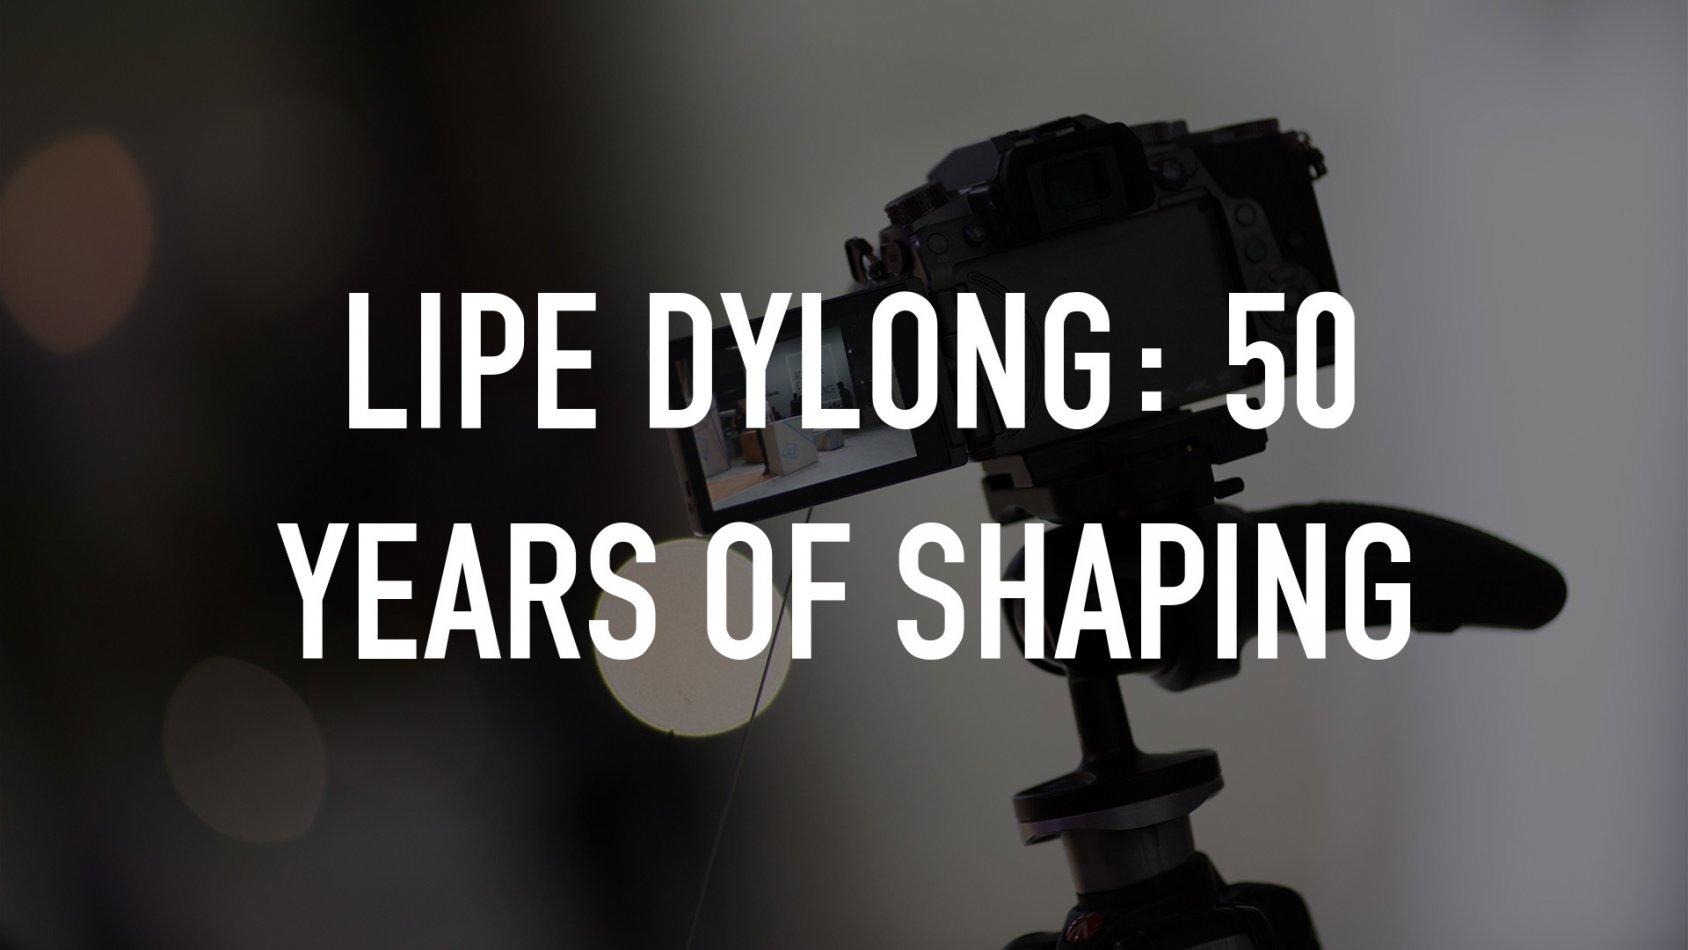 Lipe Dylong: 50 Years of Shaping